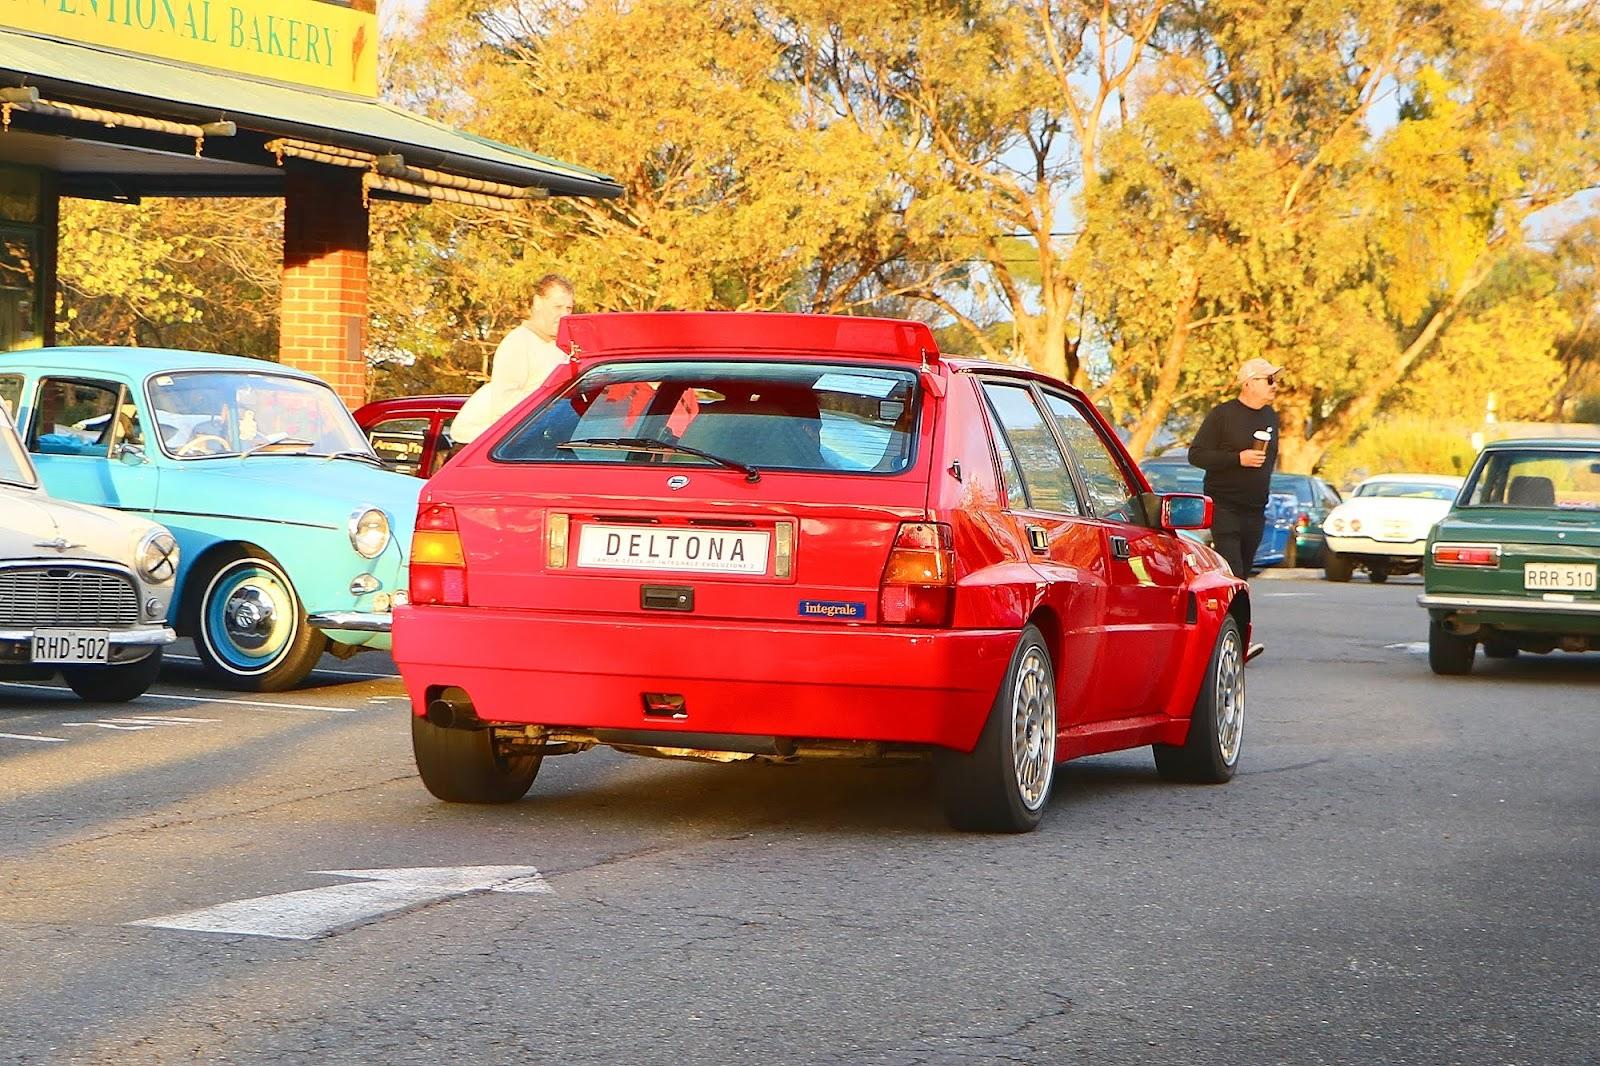 Lancia Deltona Integrale Moving Rear.jpg